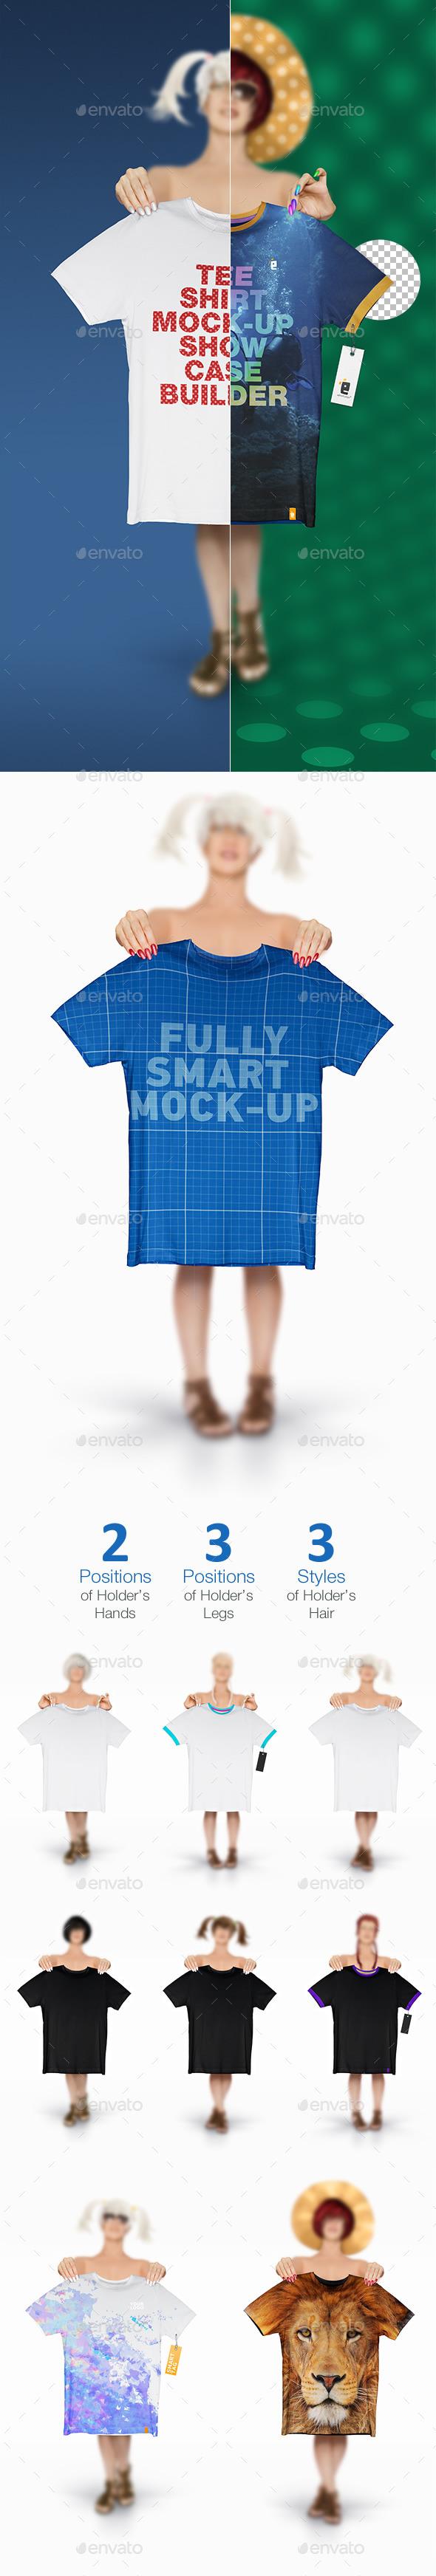 T-Shirt Mock-Up Showcase Builder Set 01 Girl - T-shirts Apparel